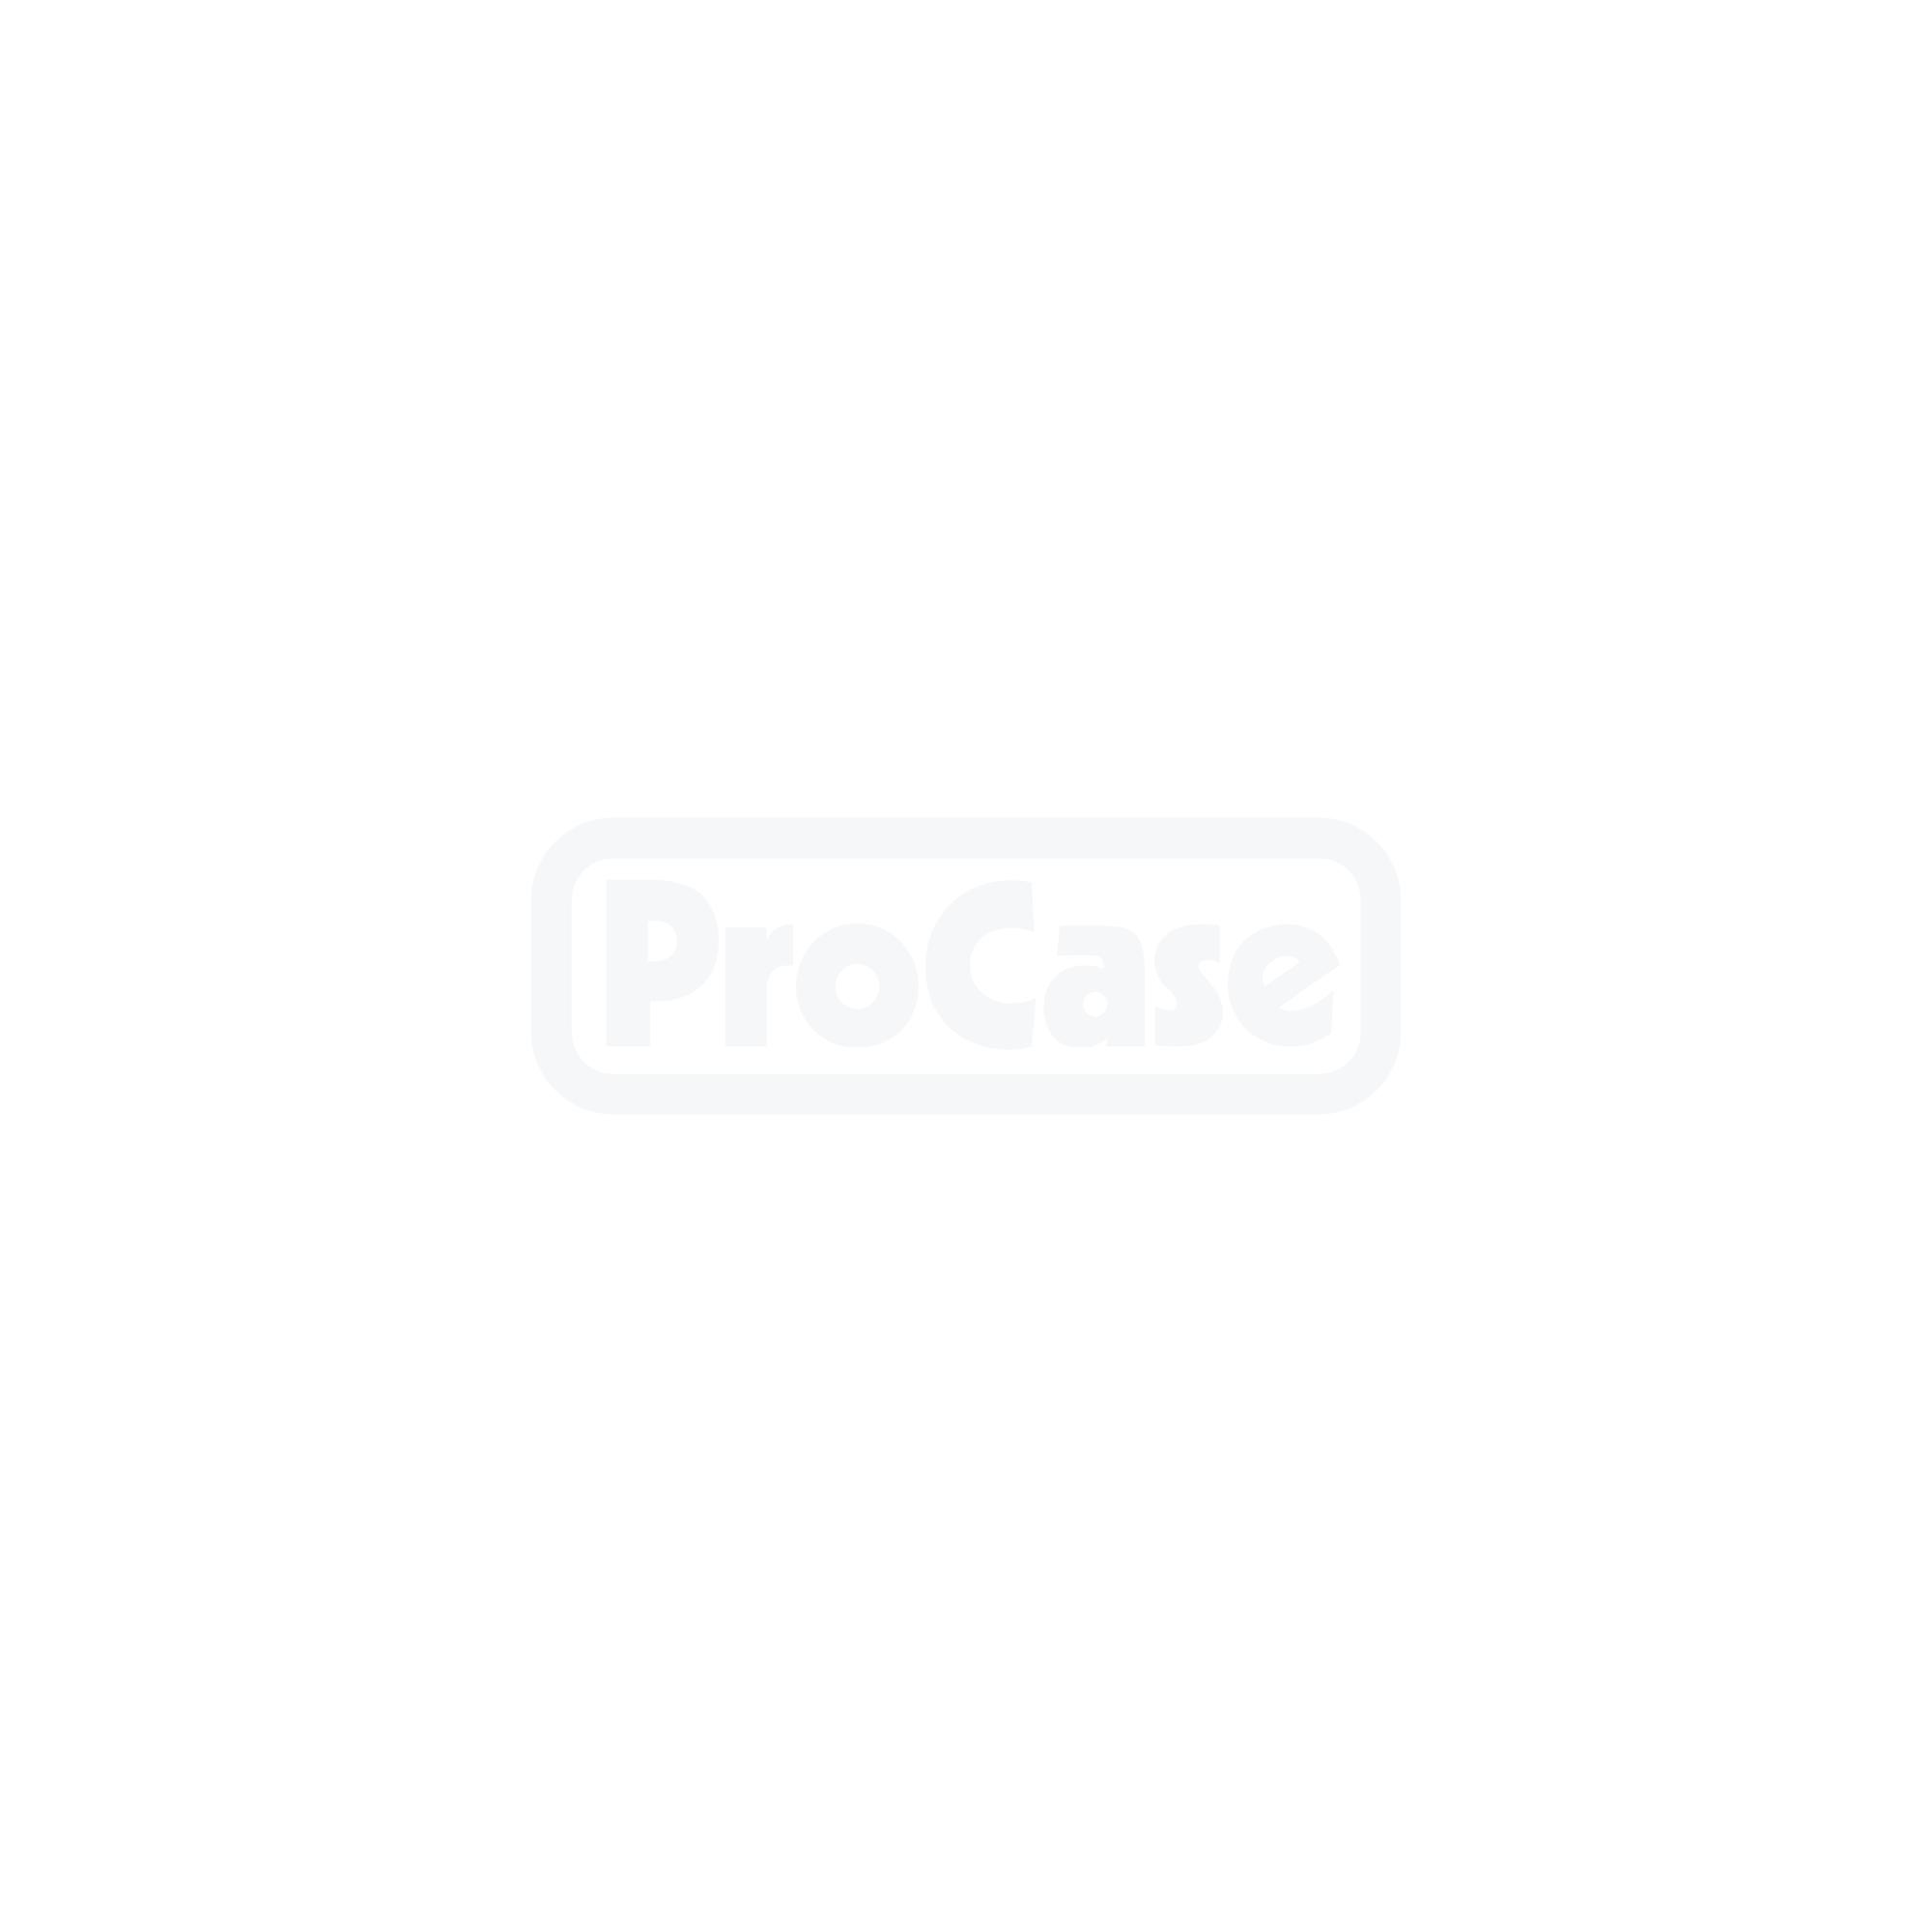 Flipcase für Yamaha Rivage PM10 CS-R10-S 3